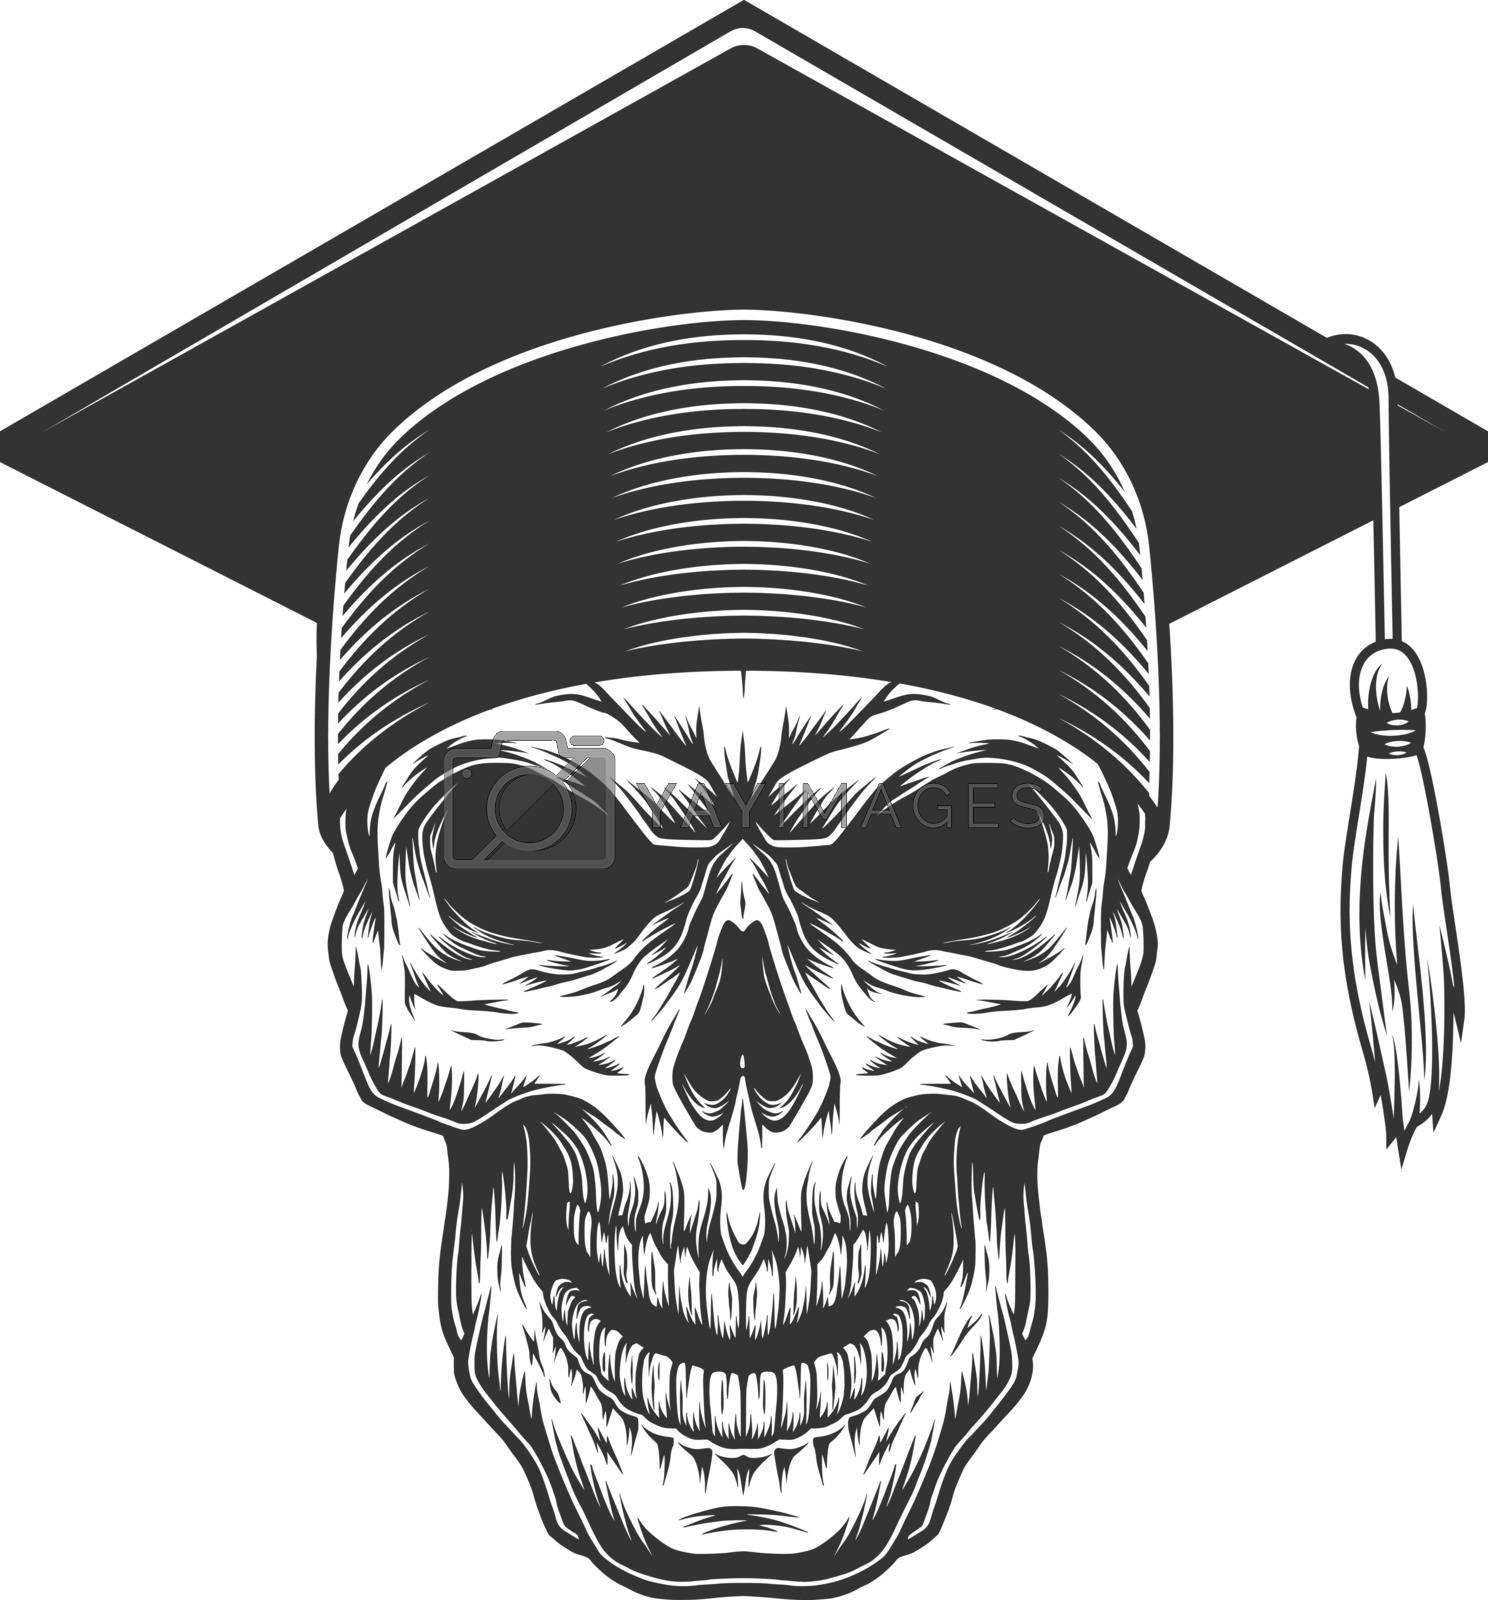 Skull in the graduate hat. Vector vintage illustration